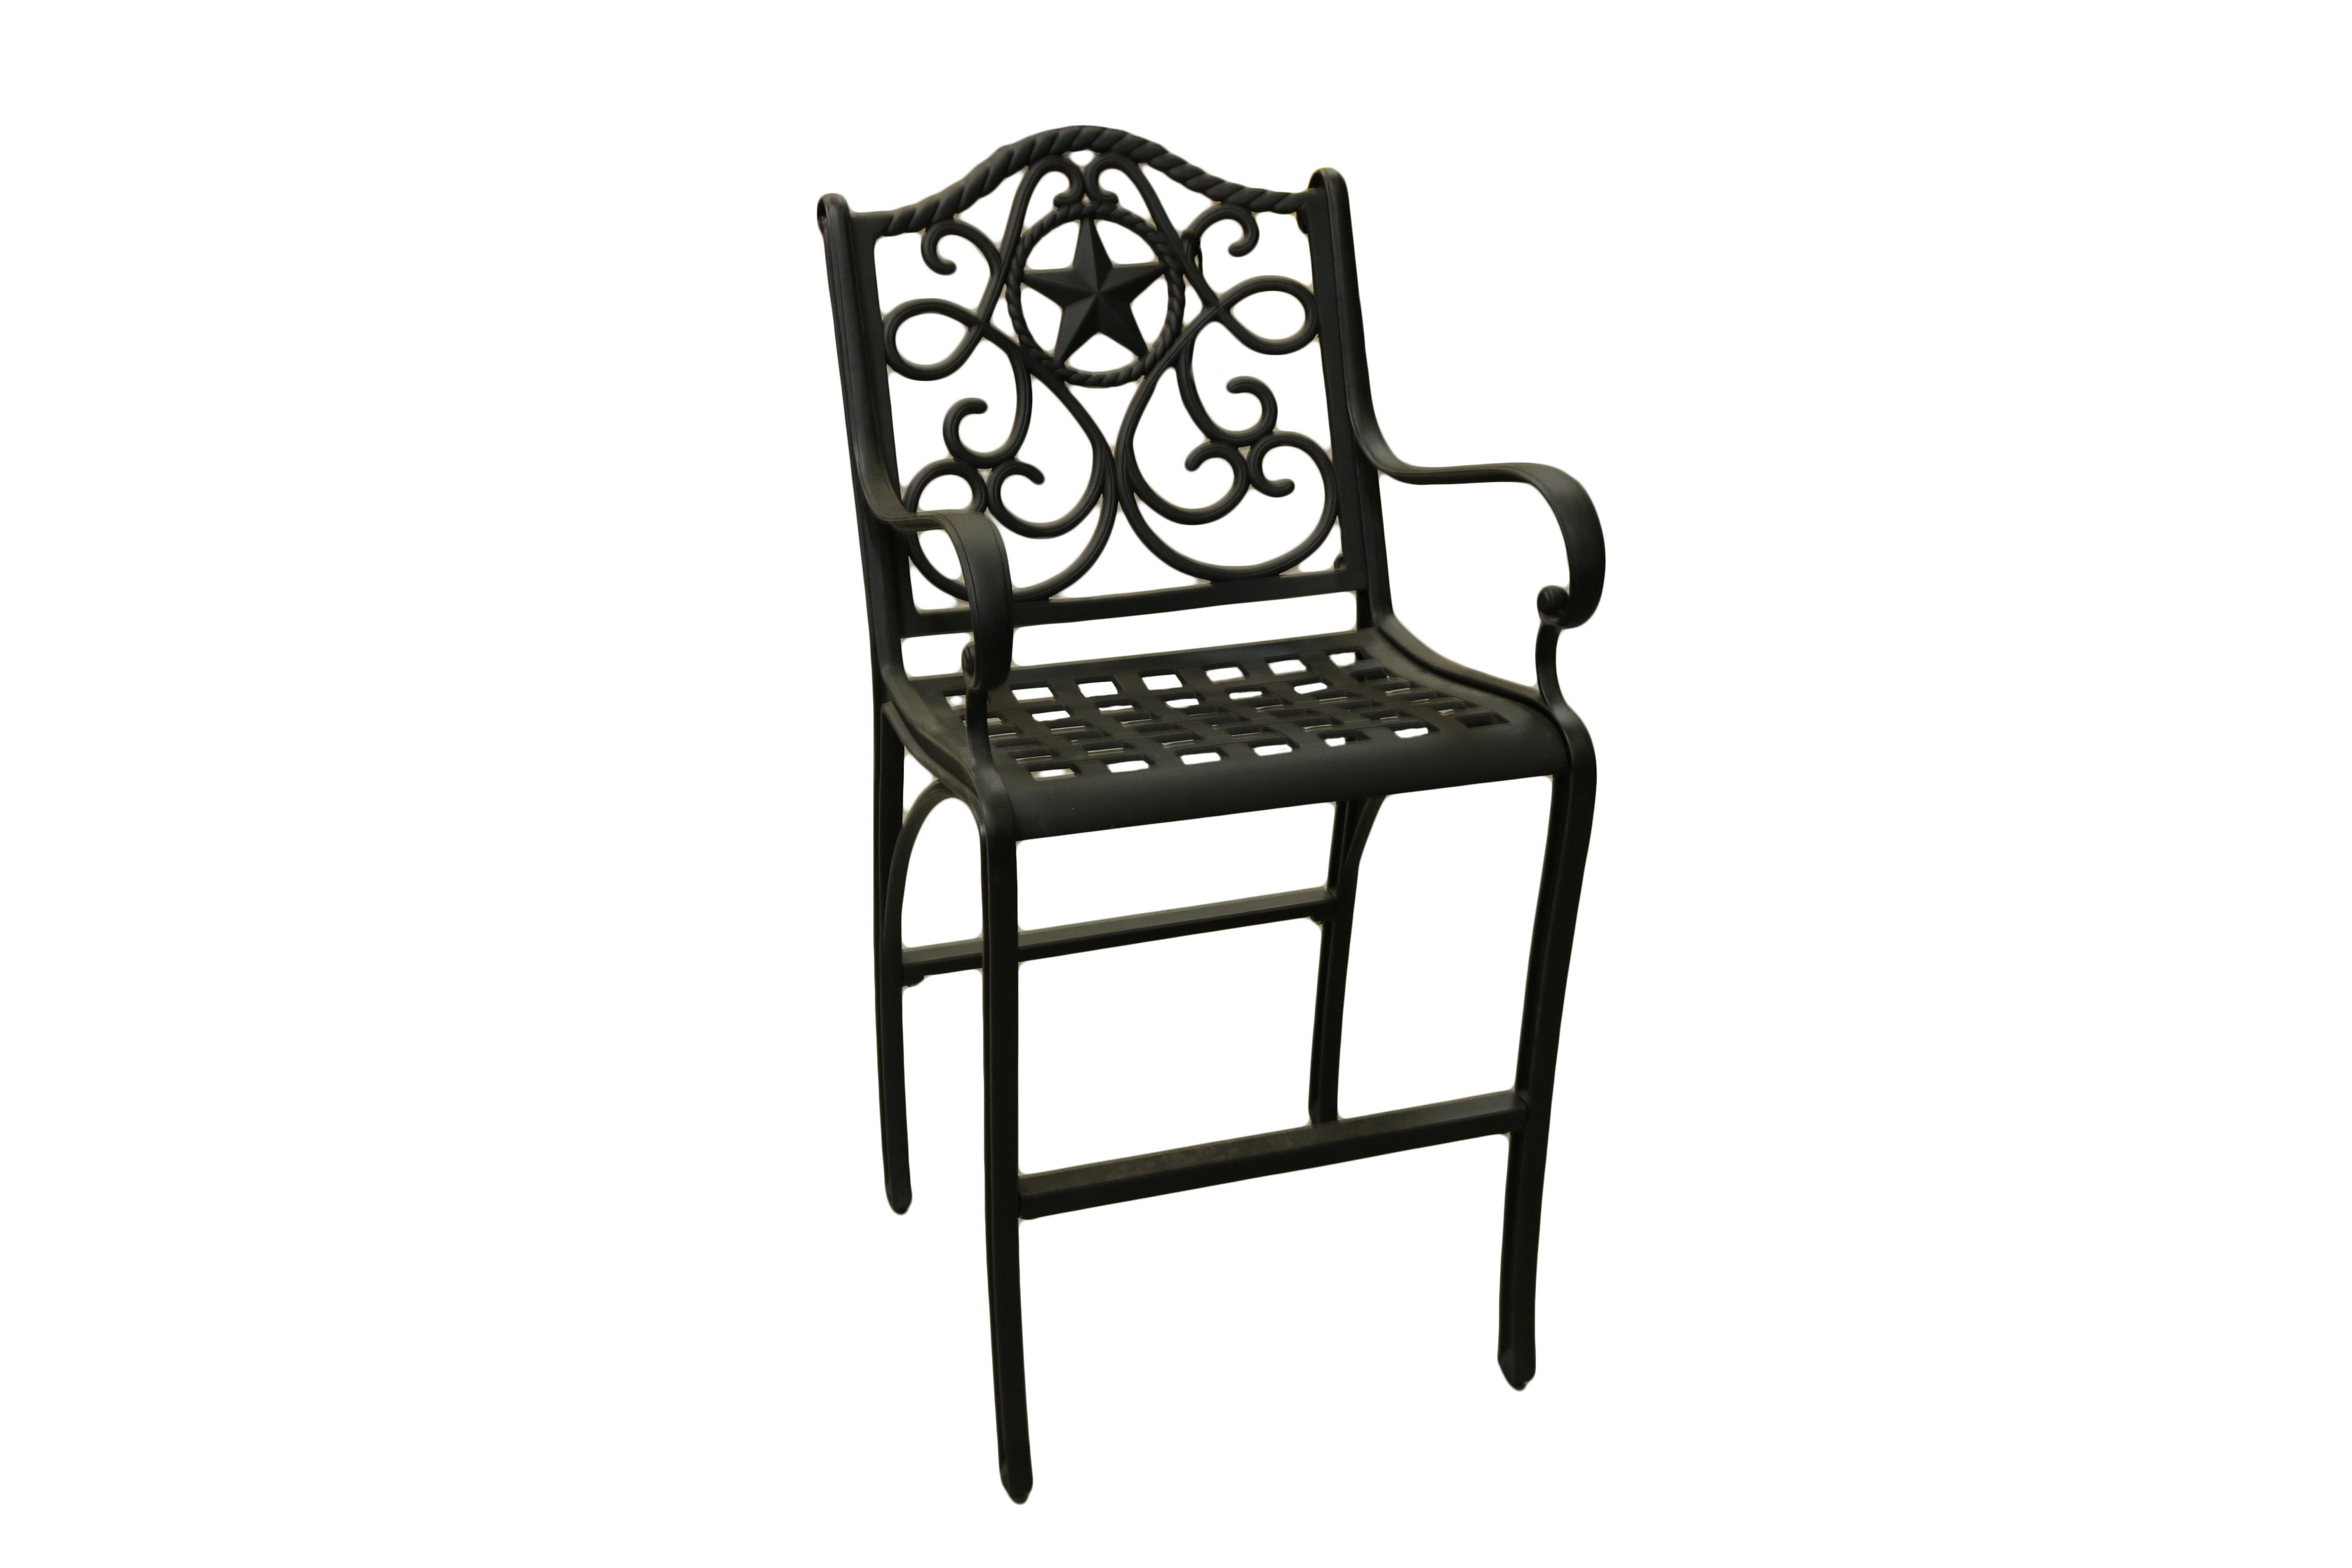 H‑E‑B Riata III Balcony Height Chair ‑ Shop Furniture at HEB